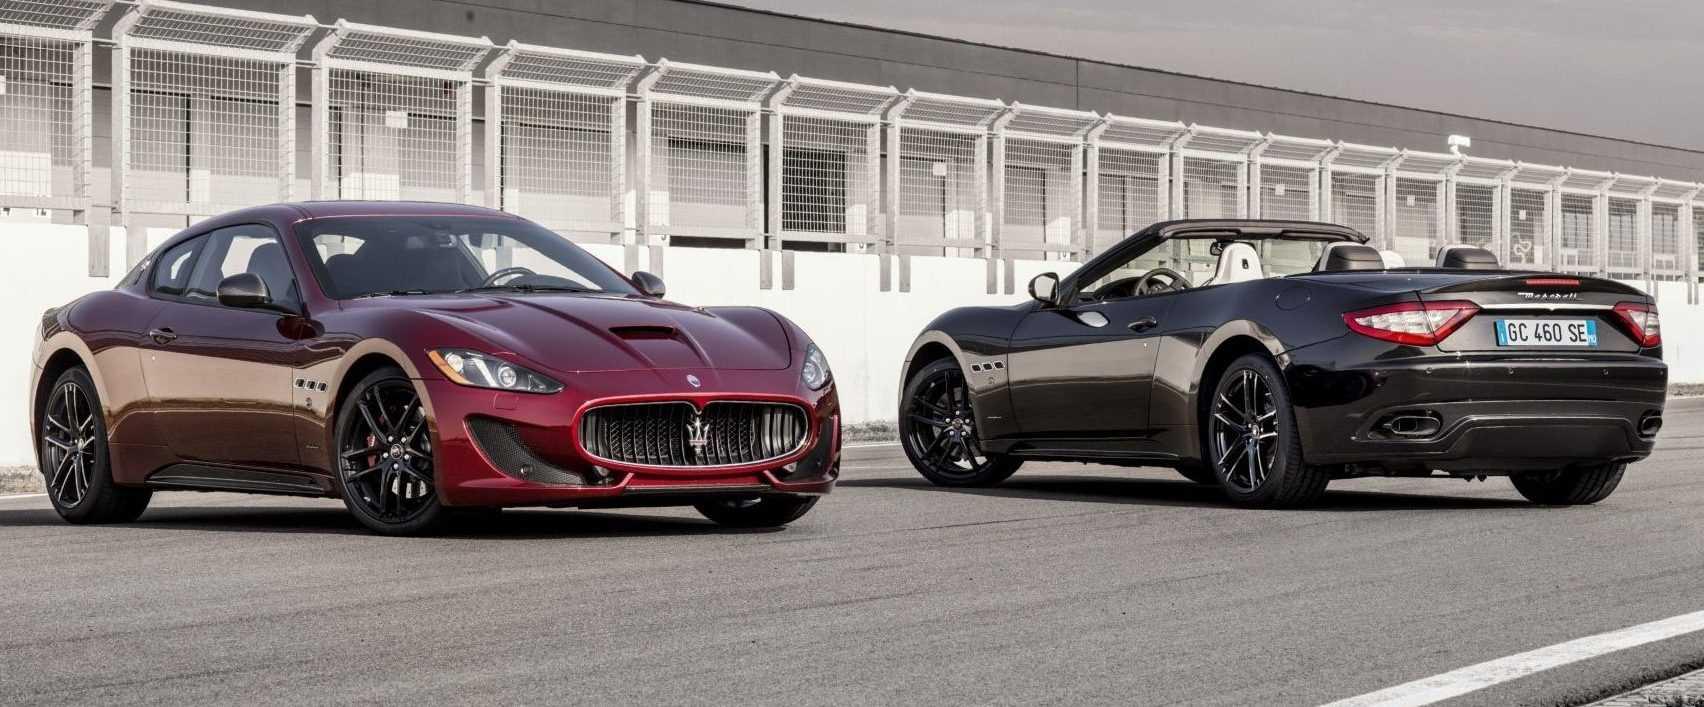 Maserati GranCoupé & GranCabrio Special Edition 2017